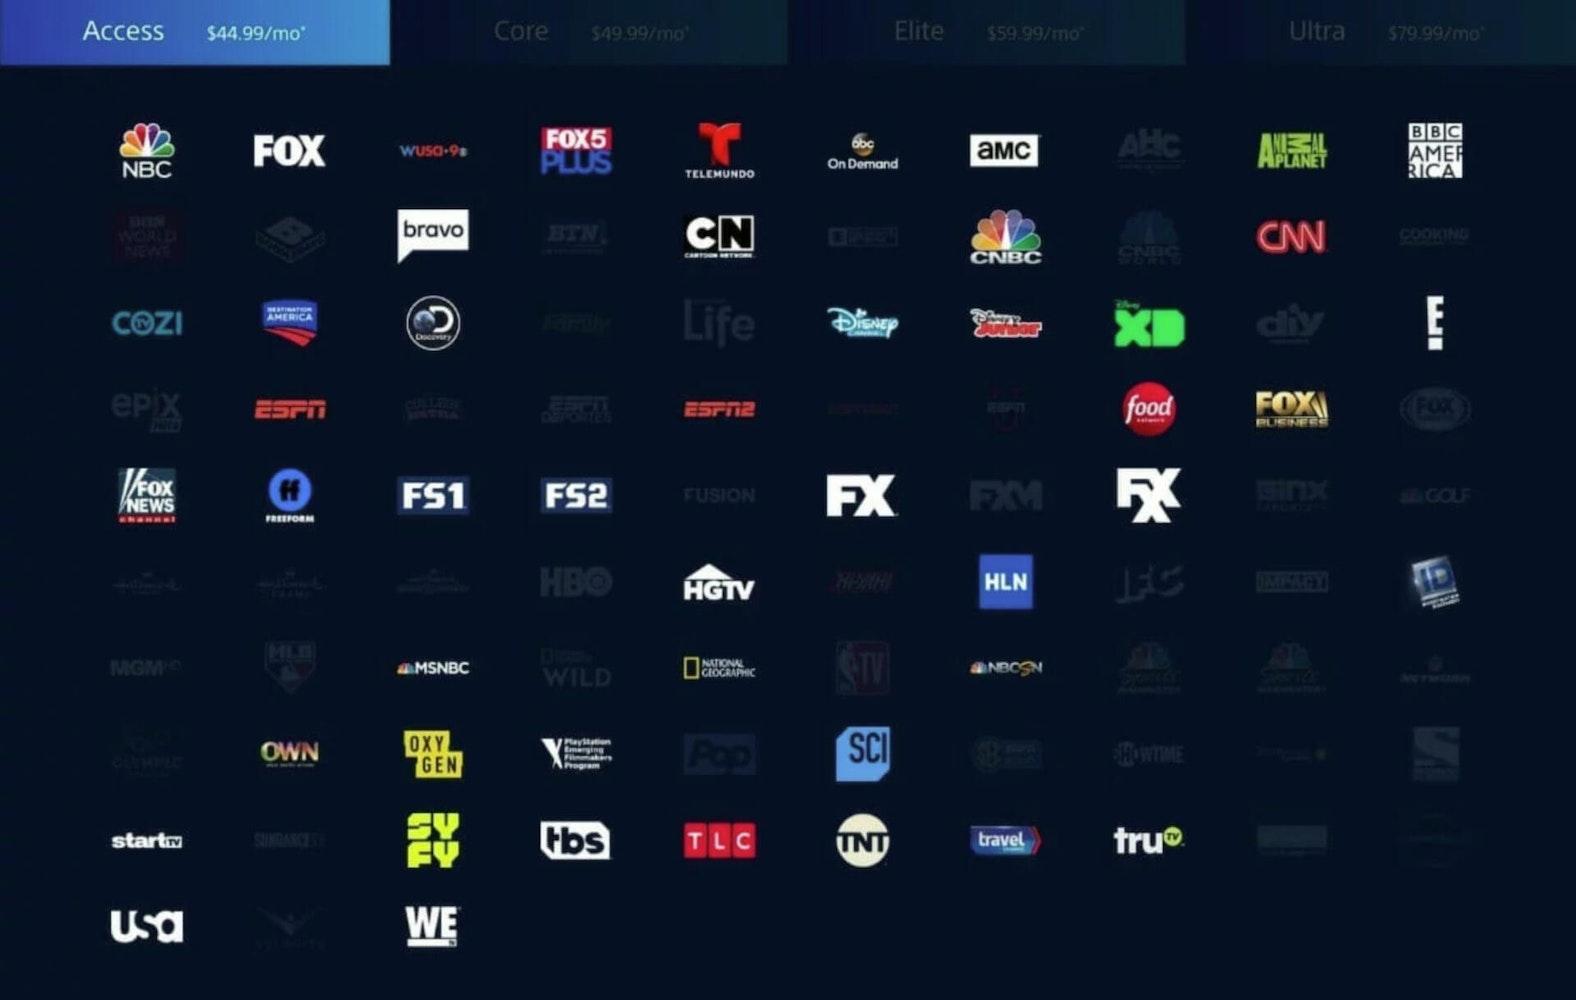 seahawks rams playstation vue nfl NFC streaming